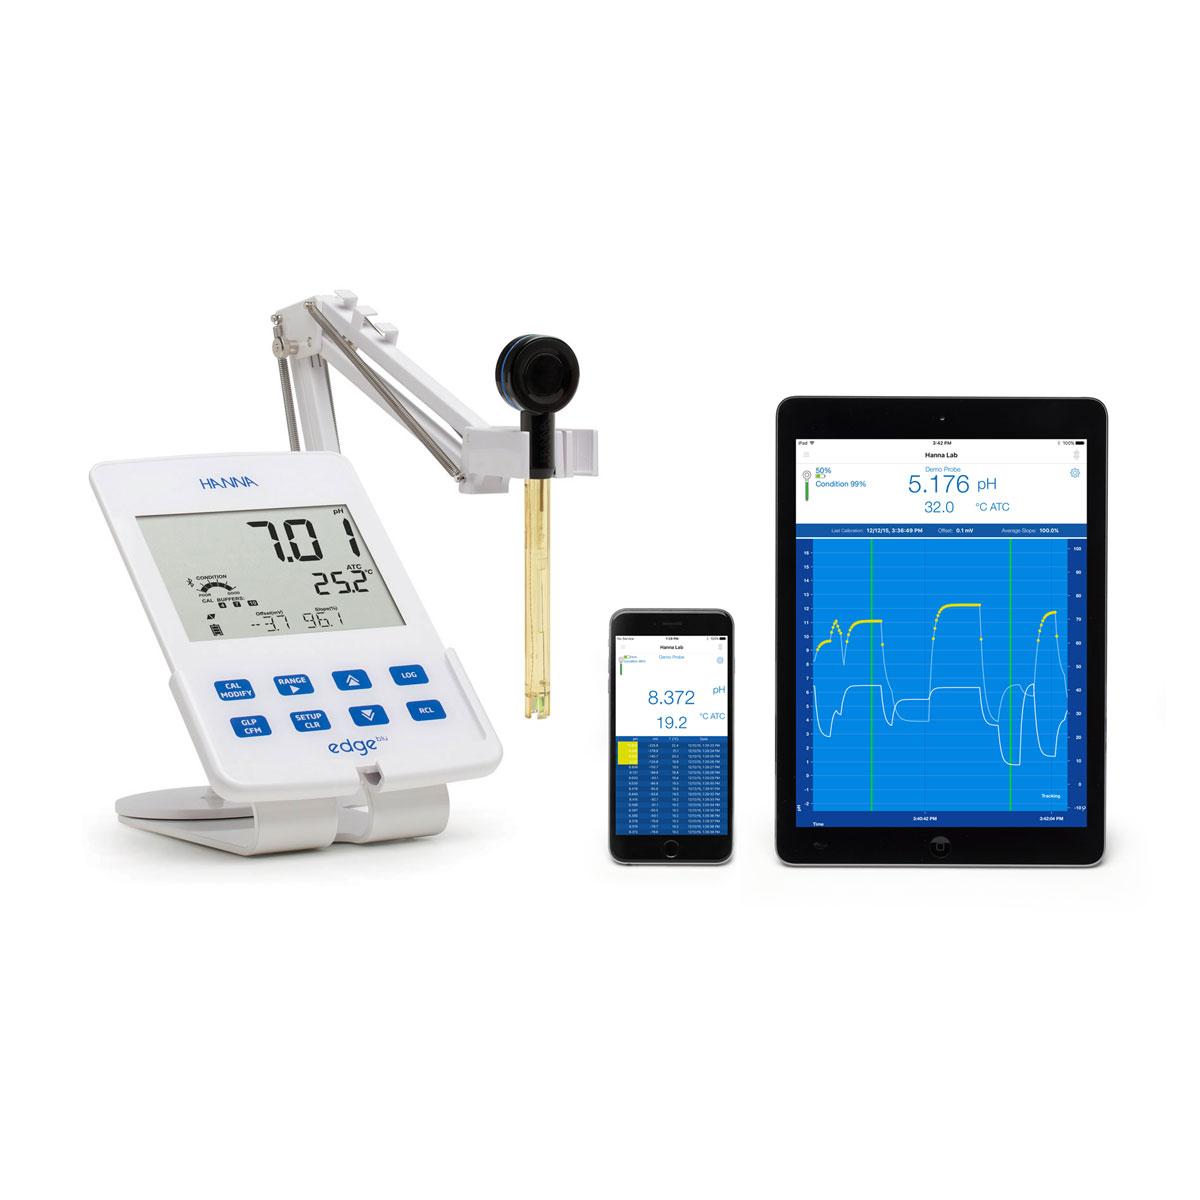 HALOTM - pH Probe with Bluetooth® Smart Technology